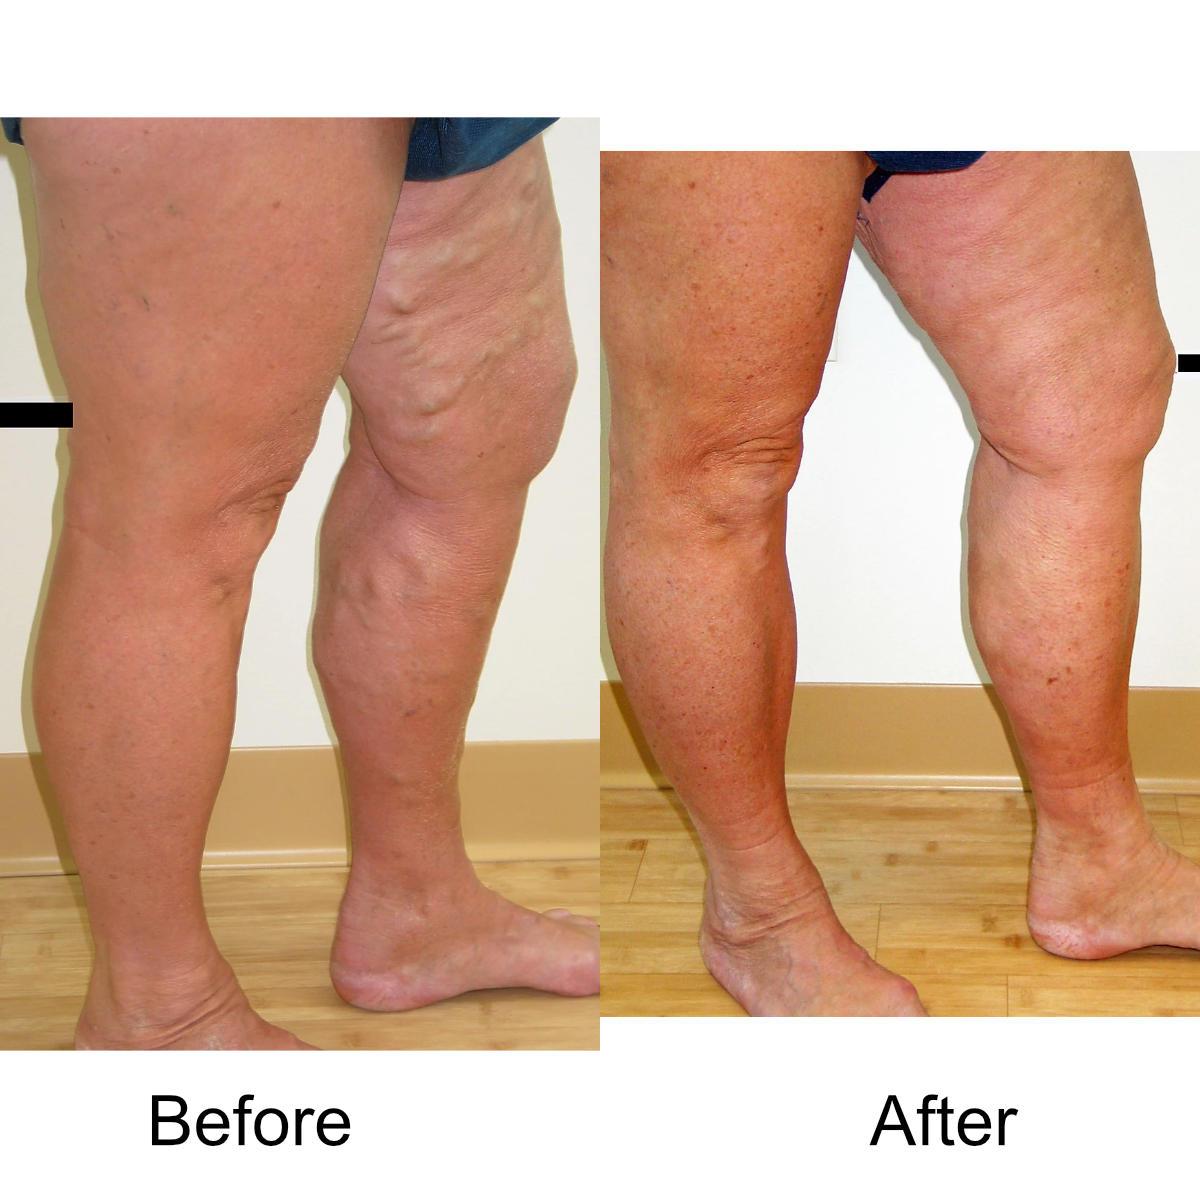 varicose-veins-comparison-17